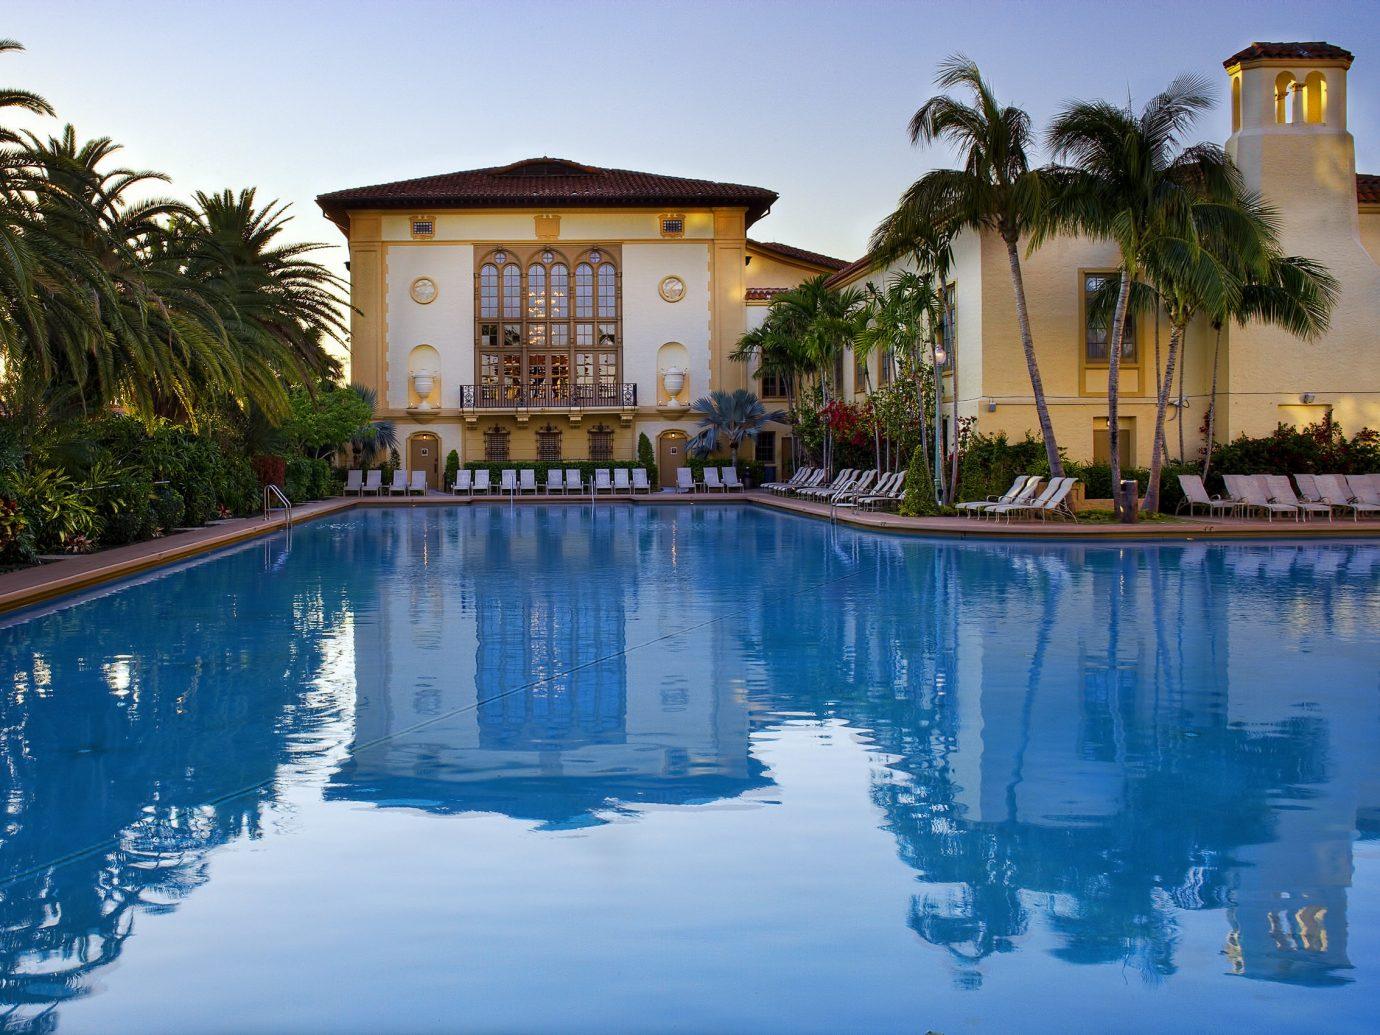 The Biltmore, Coral Gables, Florida